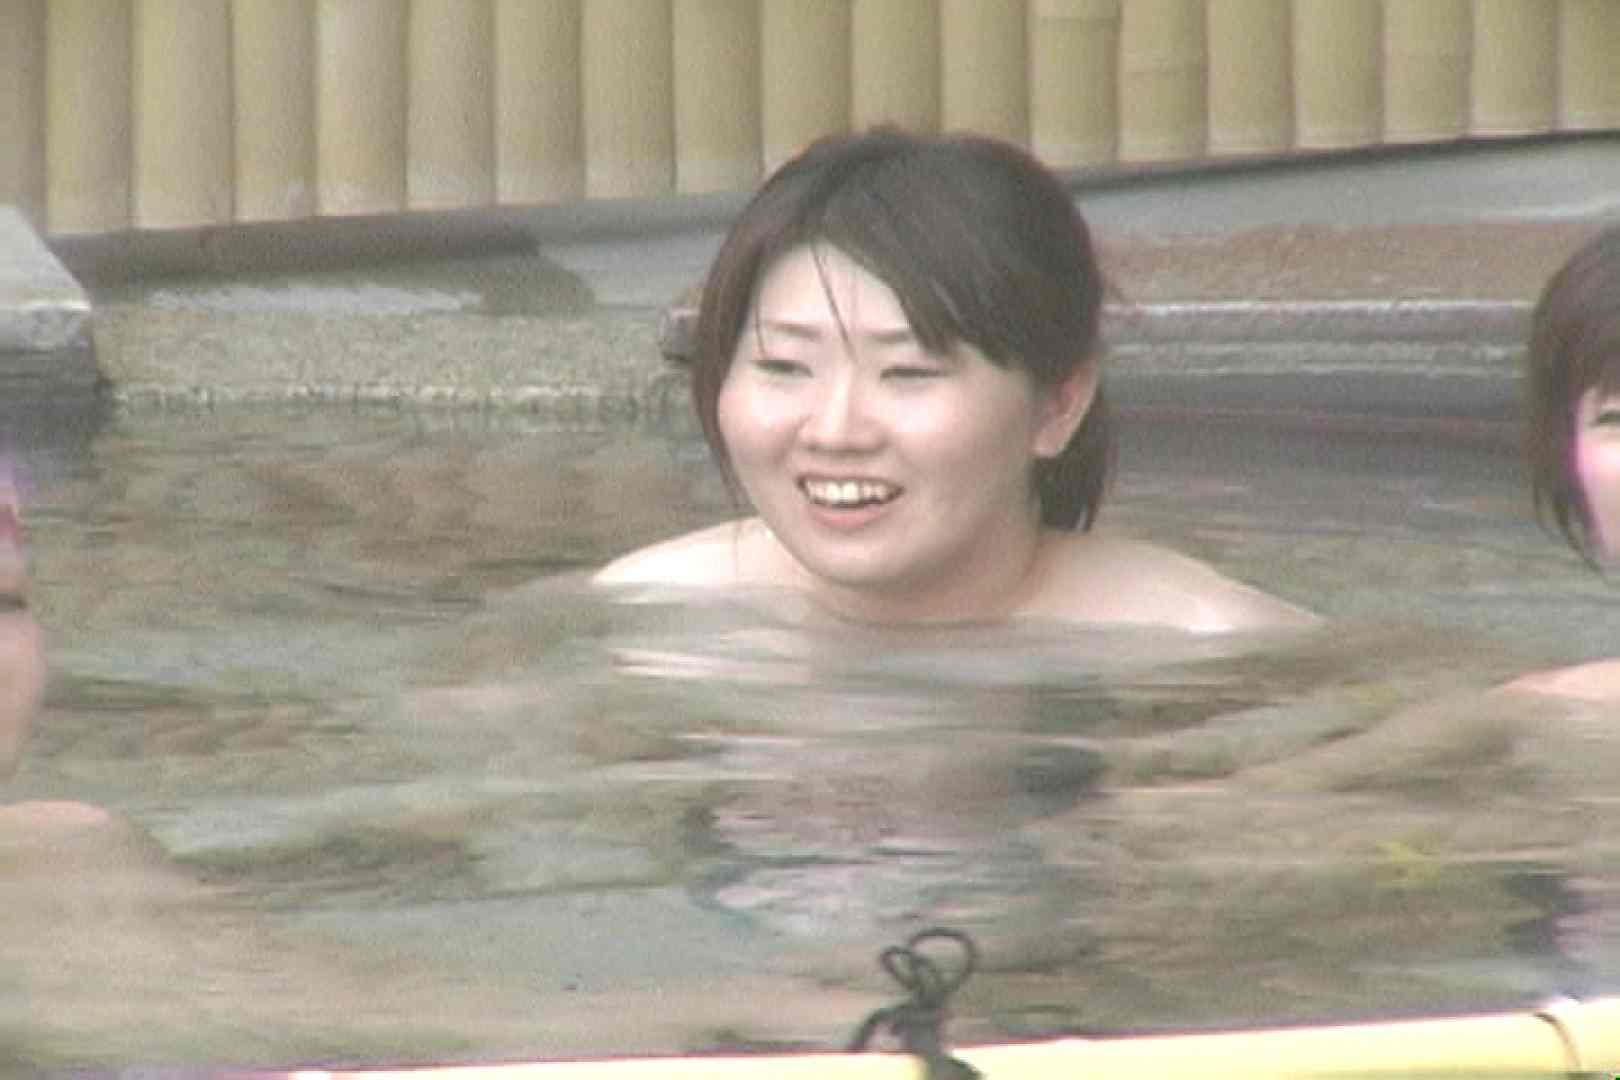 Aquaな露天風呂Vol.25 露天風呂編 | 盗撮シリーズ  91PIX 91